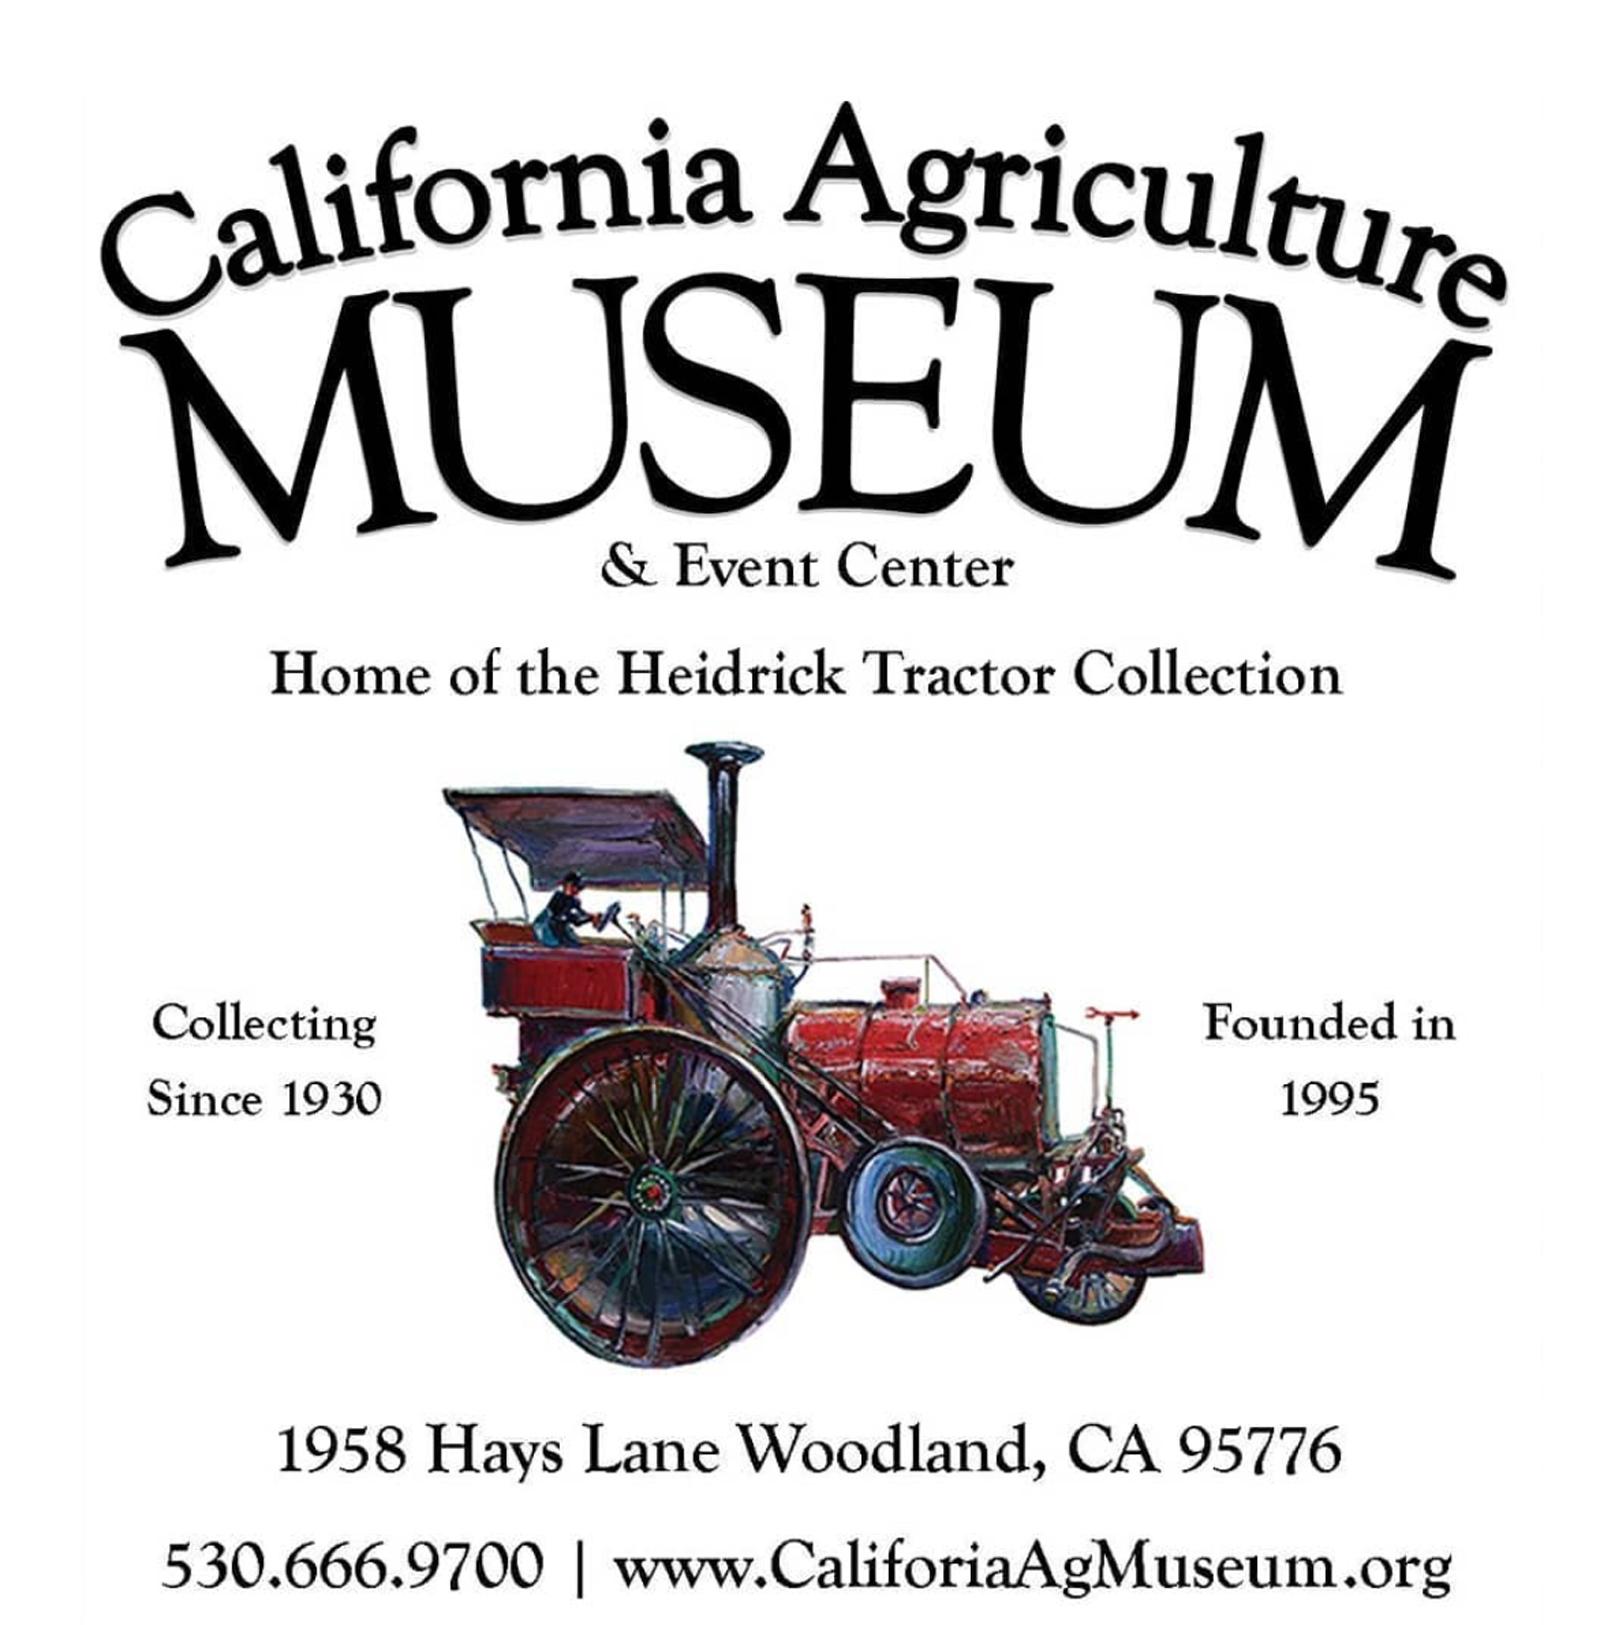 California Agricultural Museum  & Event Center